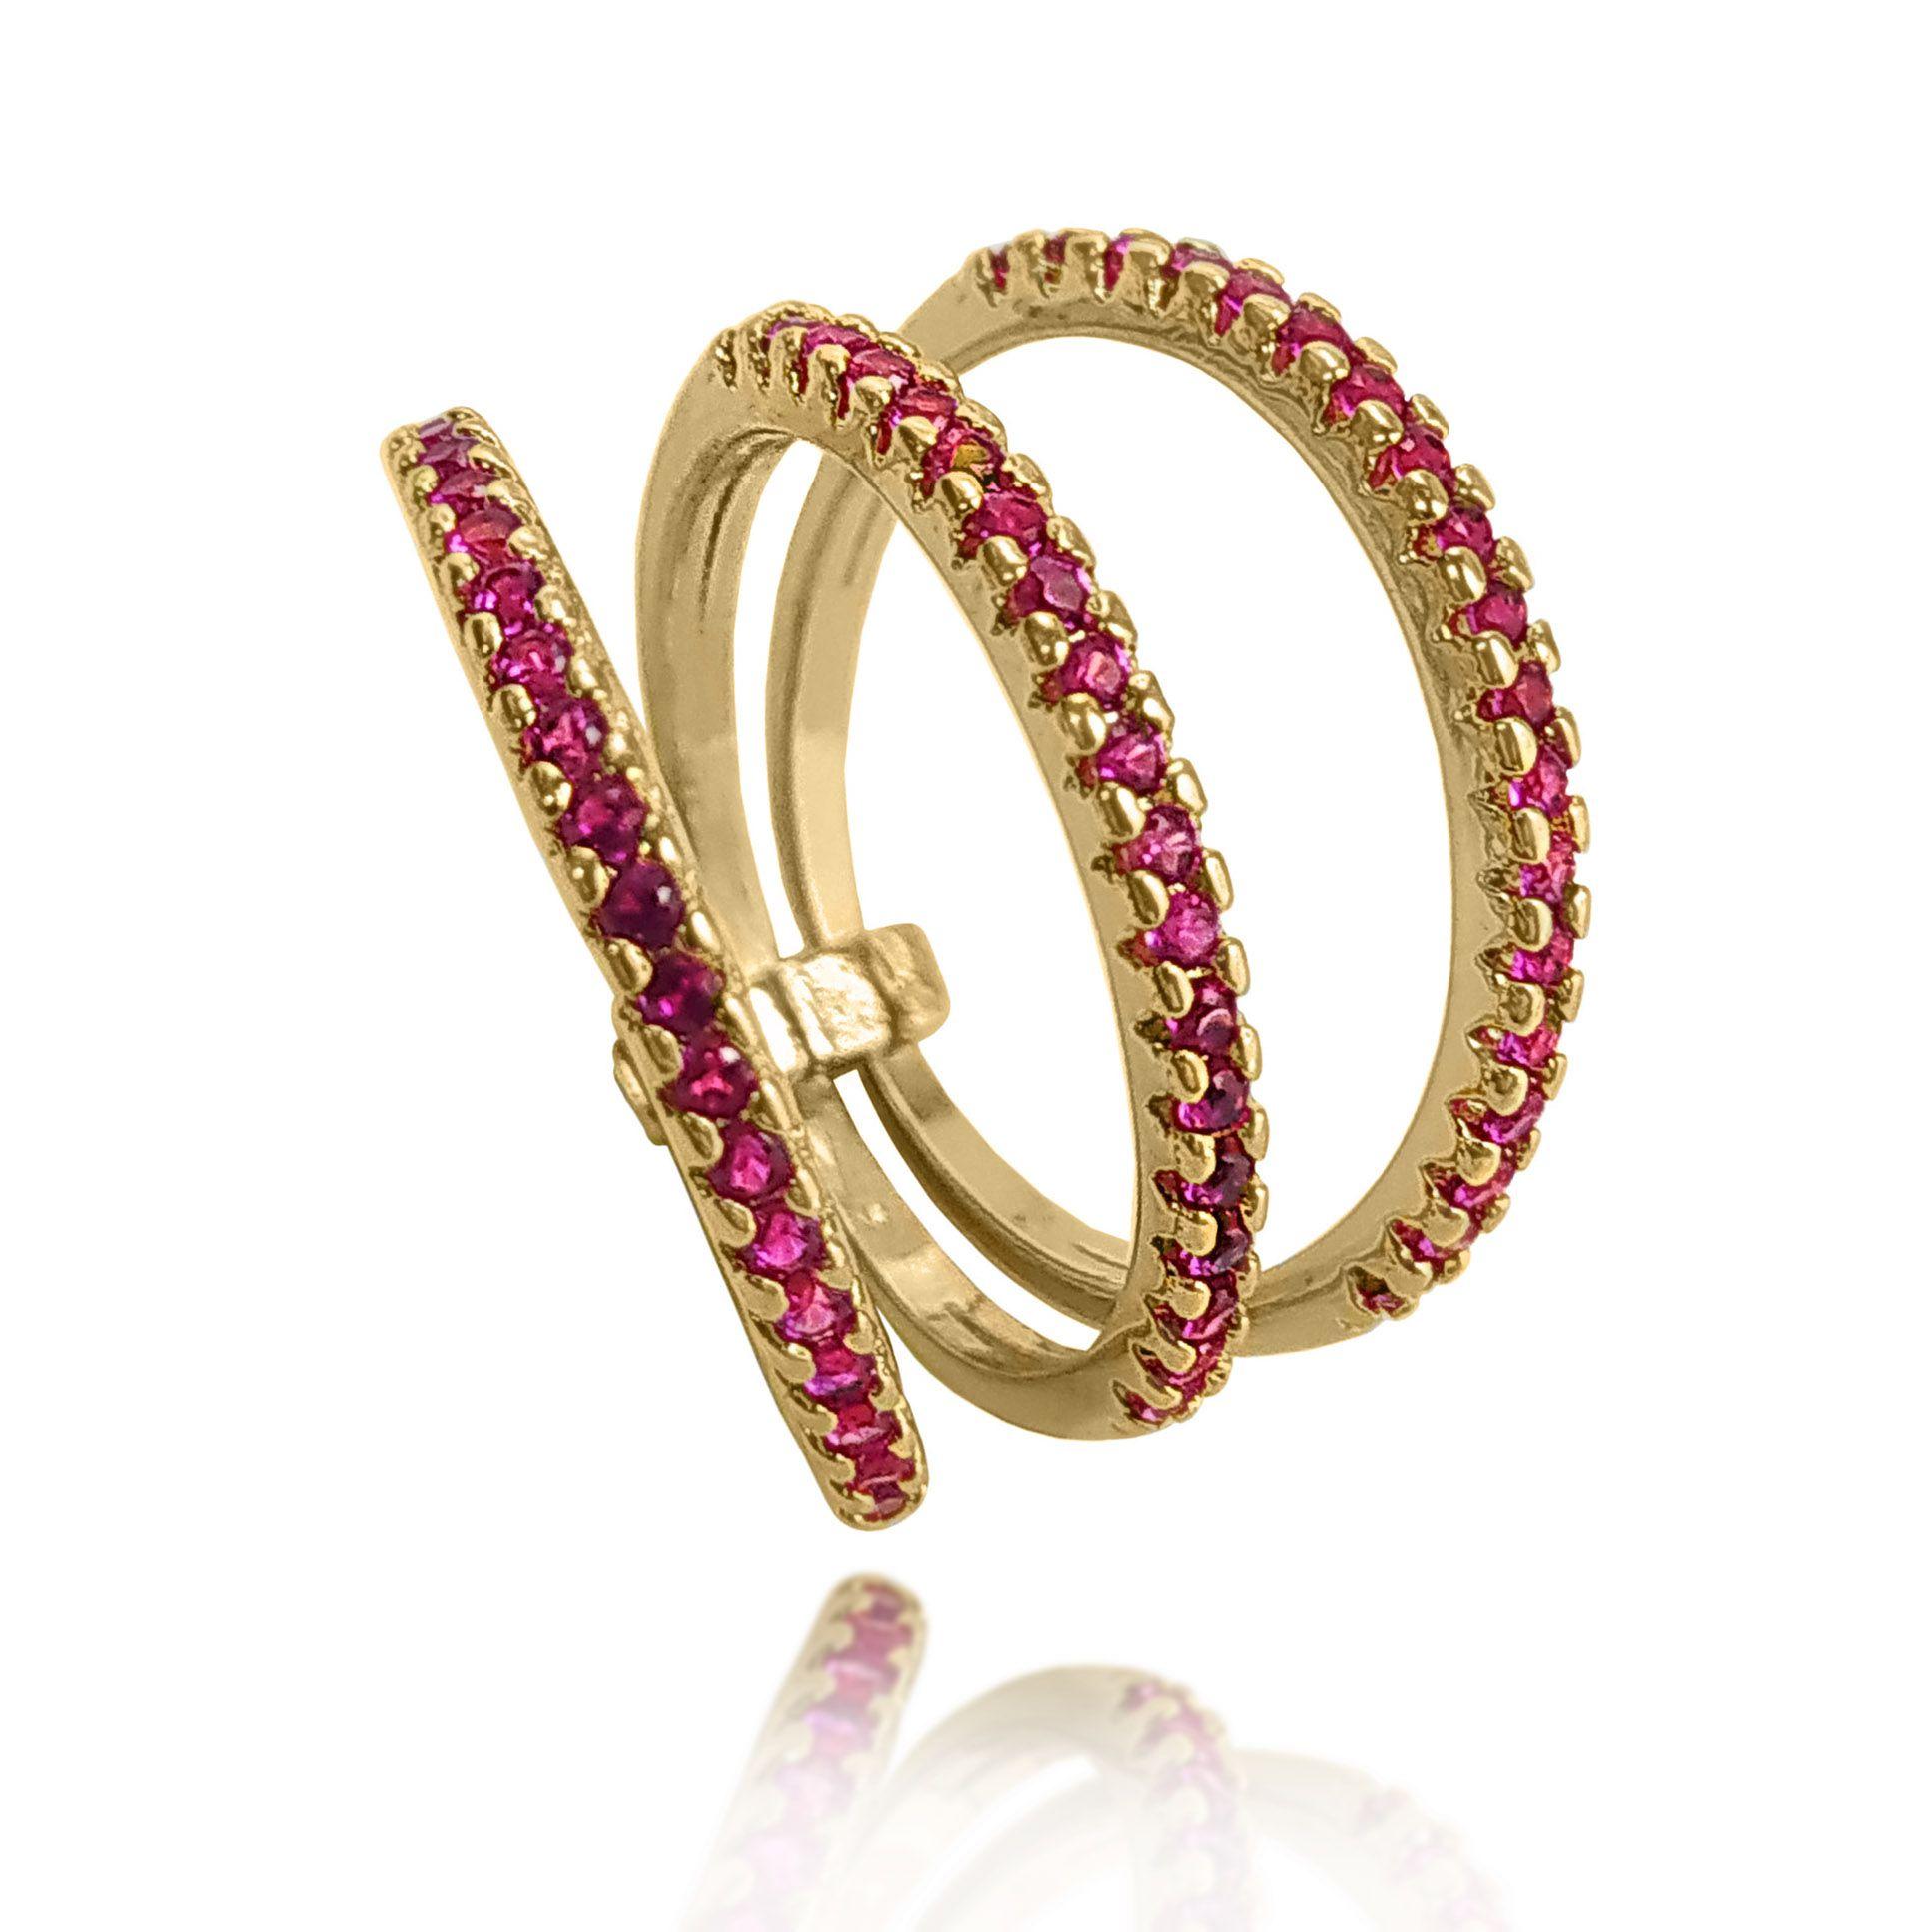 Anel Triplo Filete Pedras Coloridas Folheado a Ouro 18k